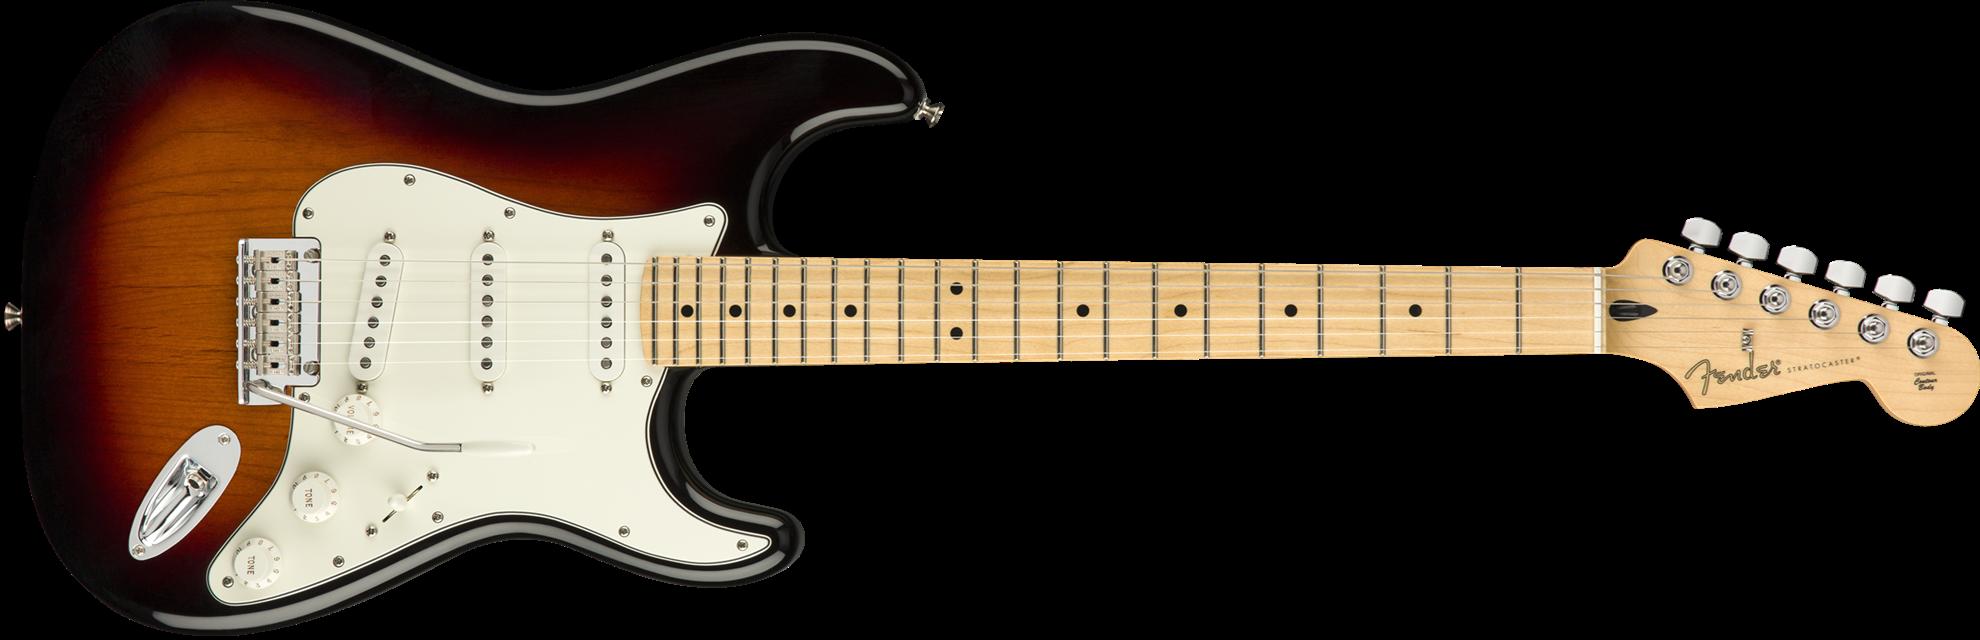 fender player stratocaster electric guitar maple neck 3 colour sunburst perth mega music. Black Bedroom Furniture Sets. Home Design Ideas